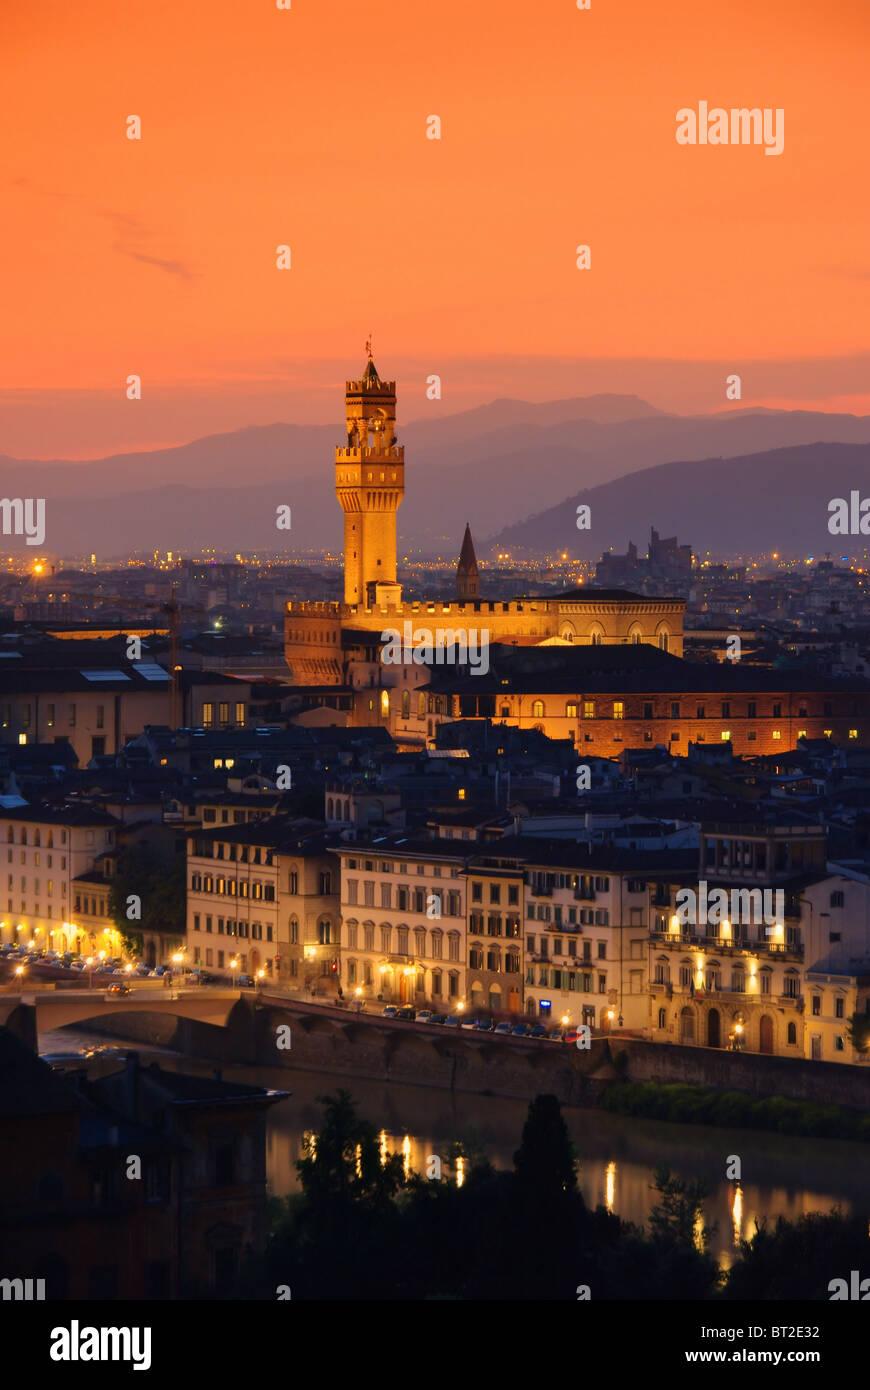 Florenz Palazzo Vecchio Abend - Florenz Palazzo Vecchio Abend 01 Stockbild